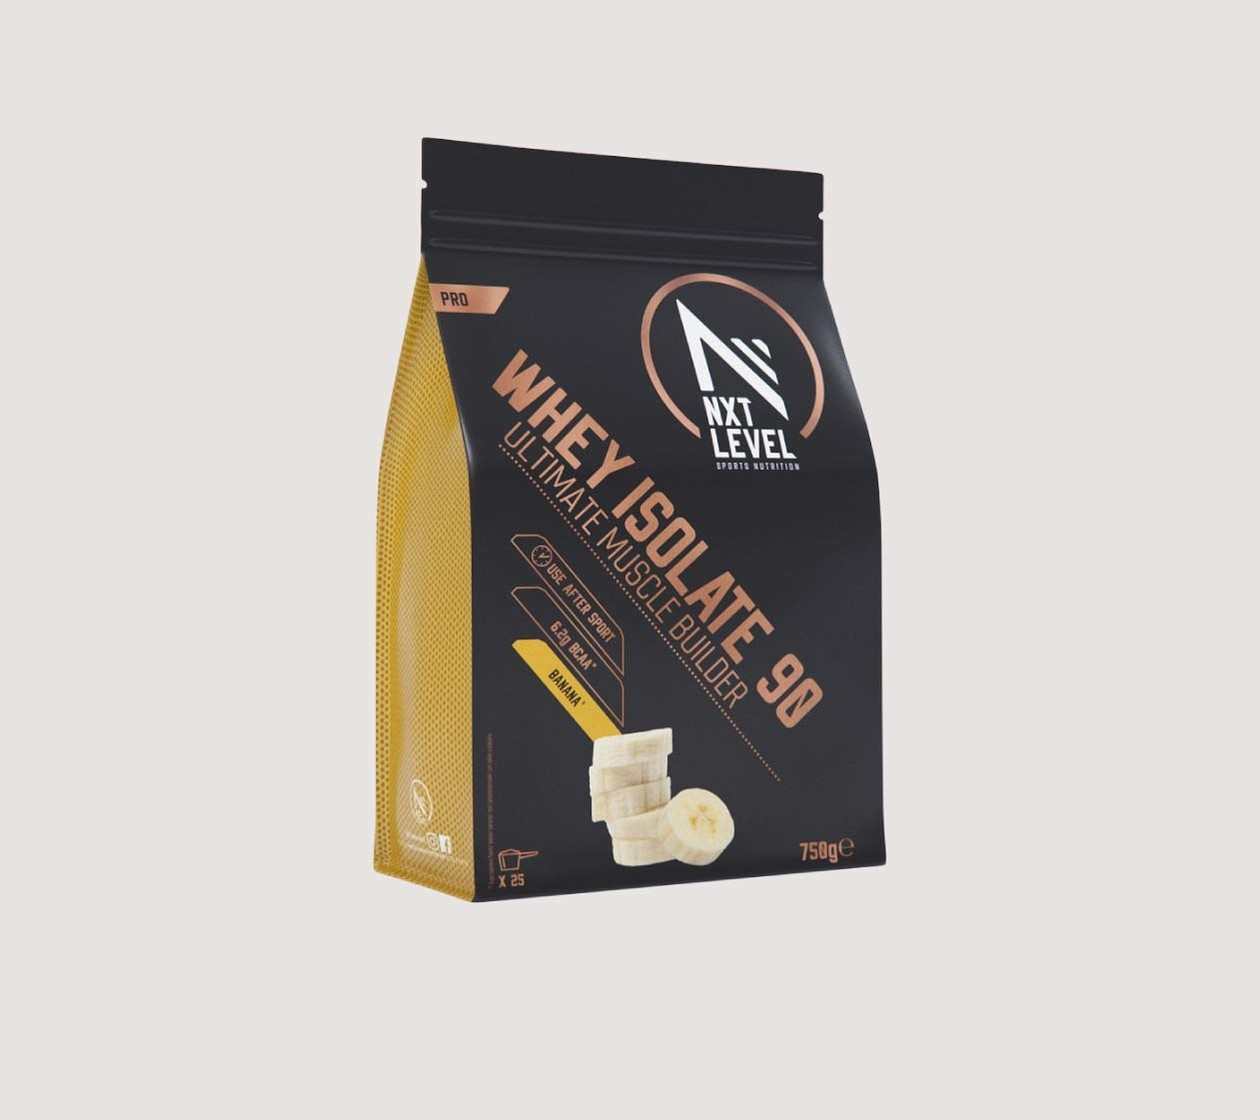 Whey Isolate 90 (750g) - Kies uit 4 smaken